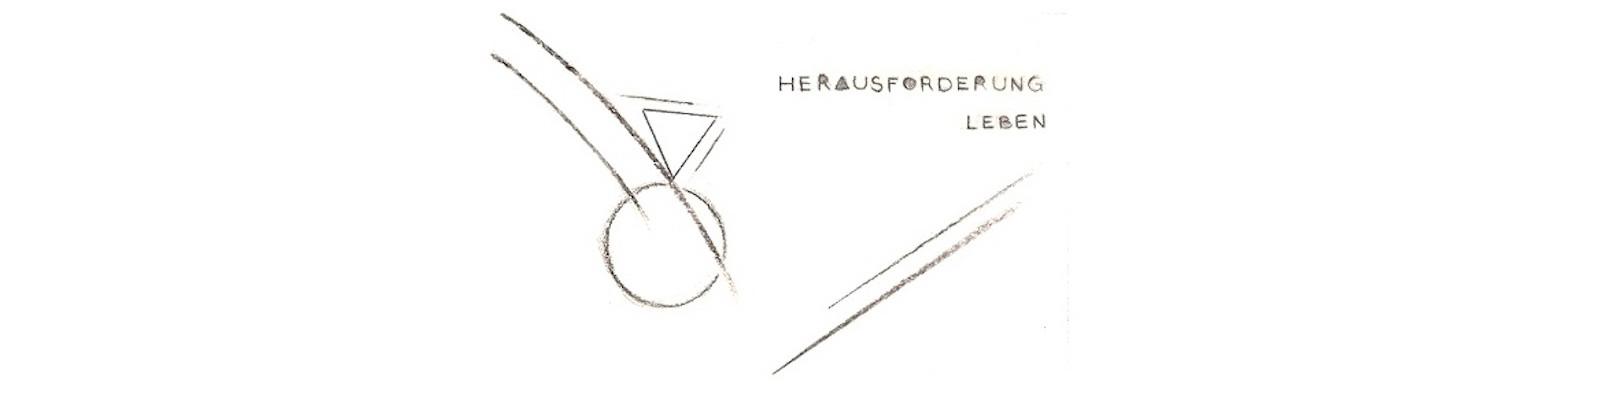 Logo Herausforderung Leben